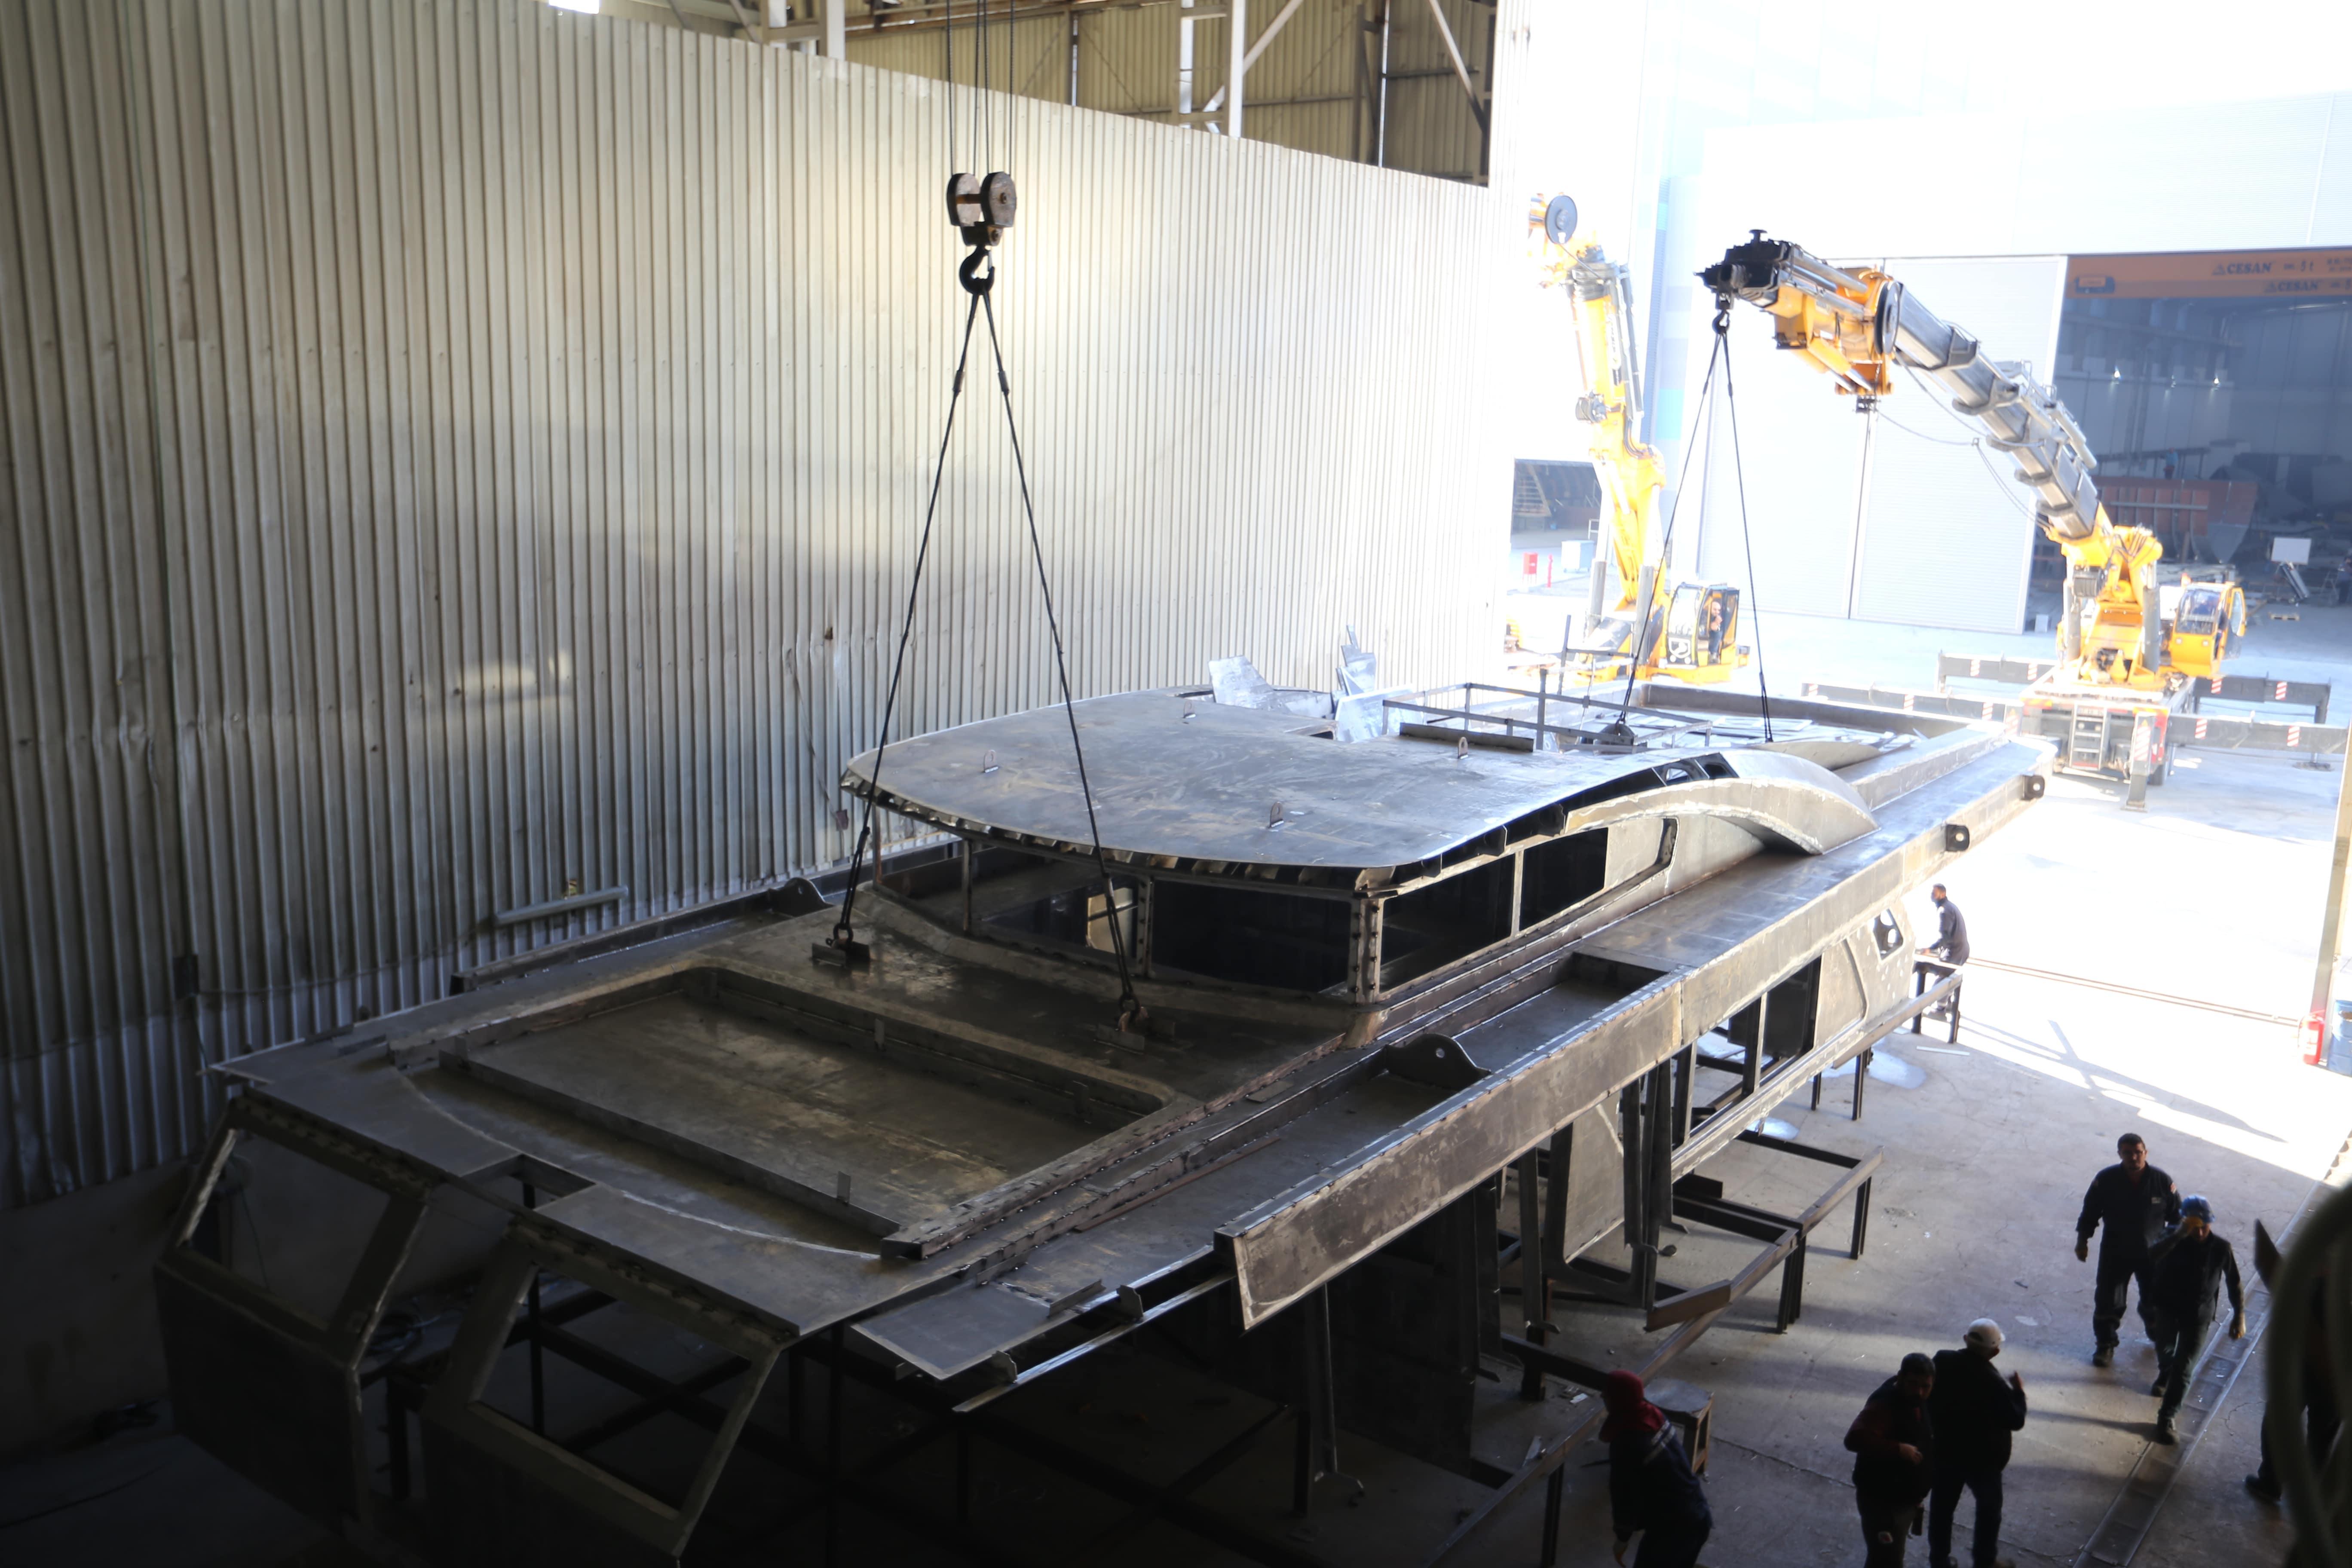 Bering 92 yacht under construction